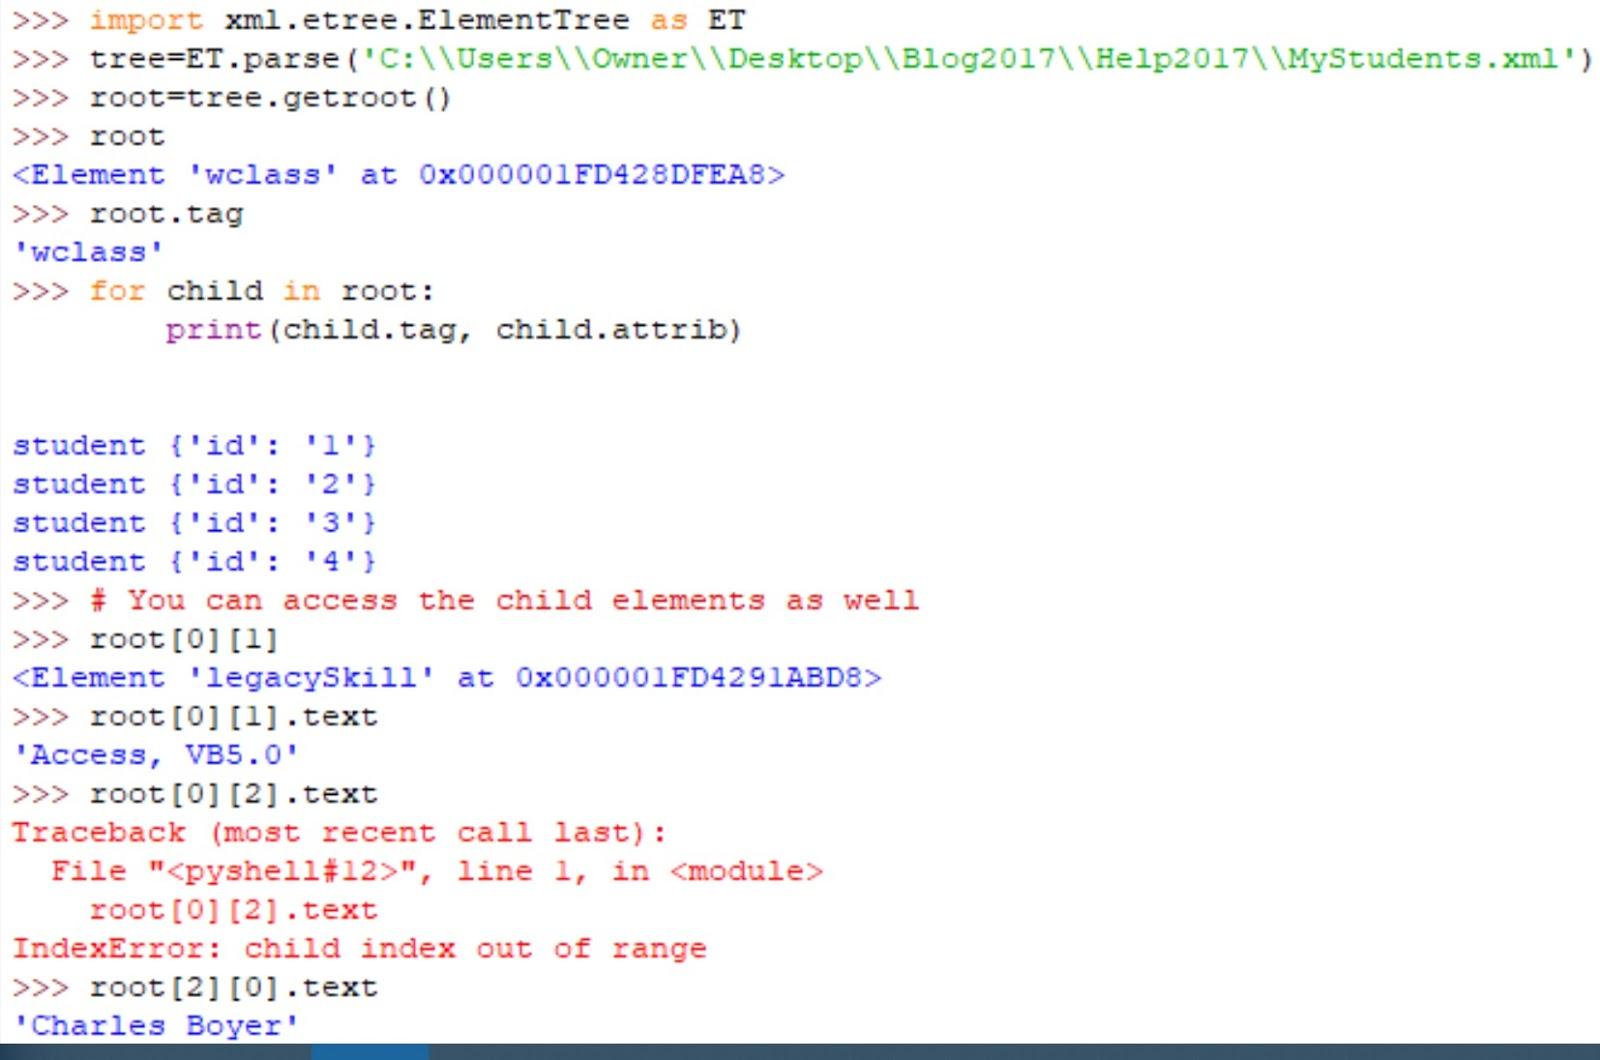 Hodentek: Parsing XML with Python 3.7